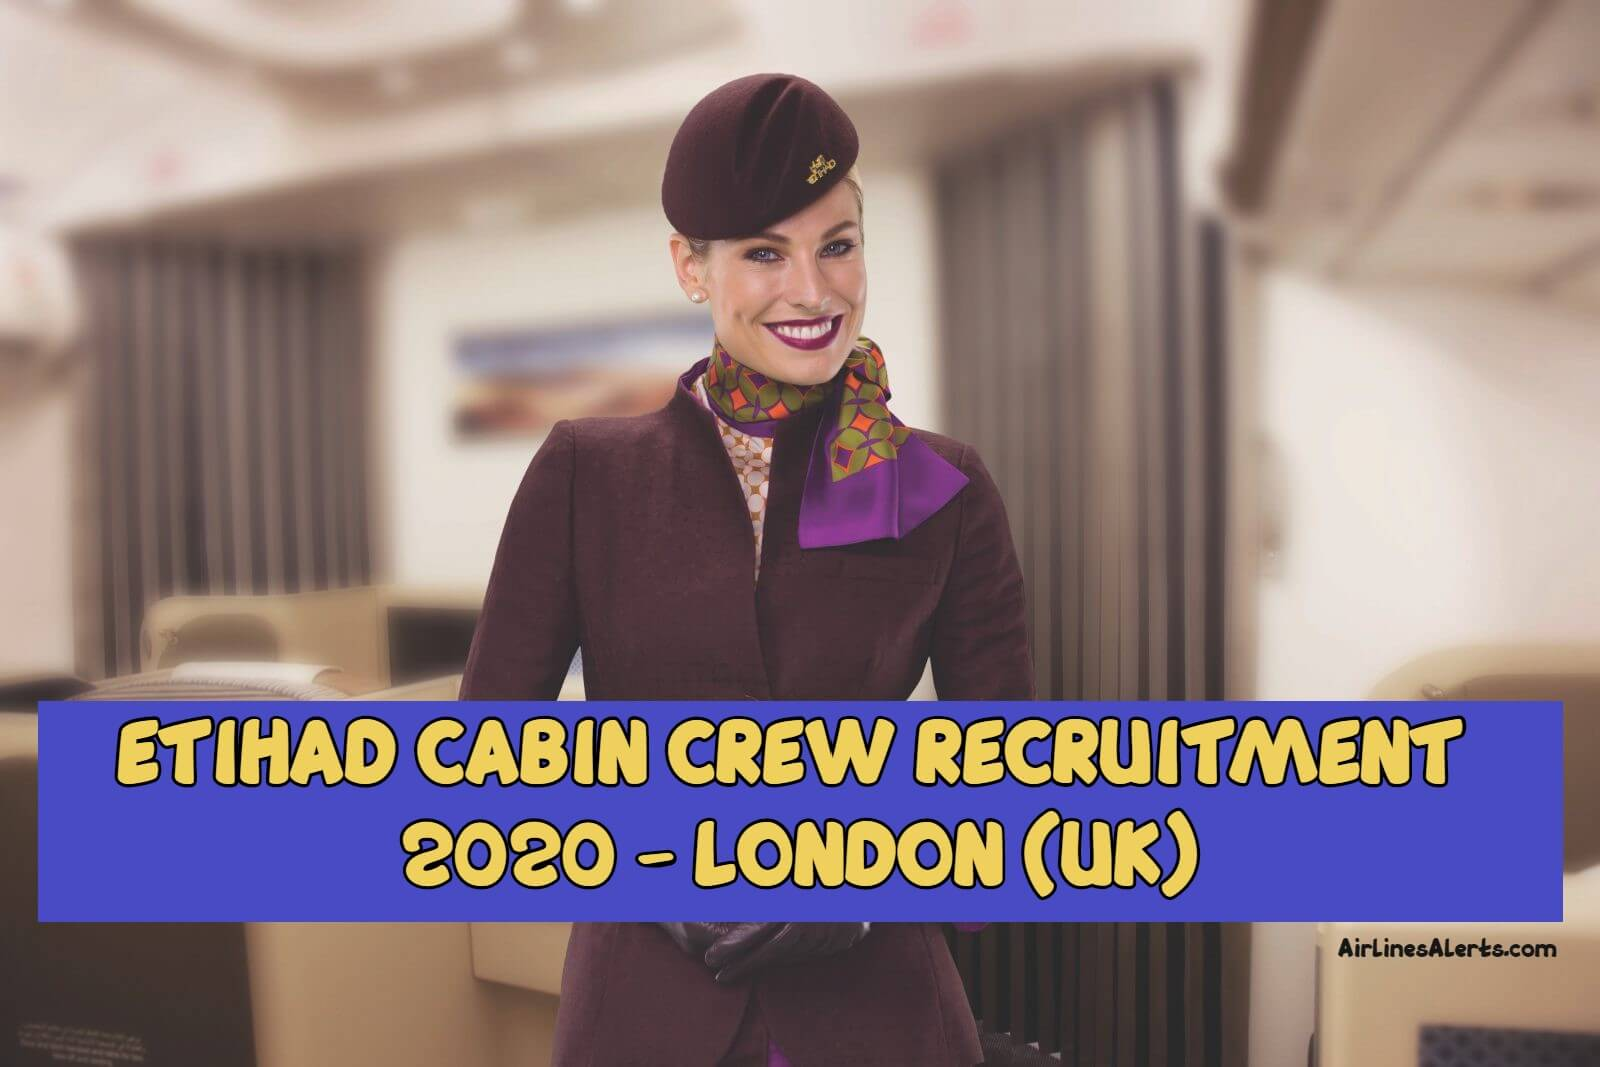 Etihad Cabin Crew Recruitment United Kingdom 2020 - LONDON